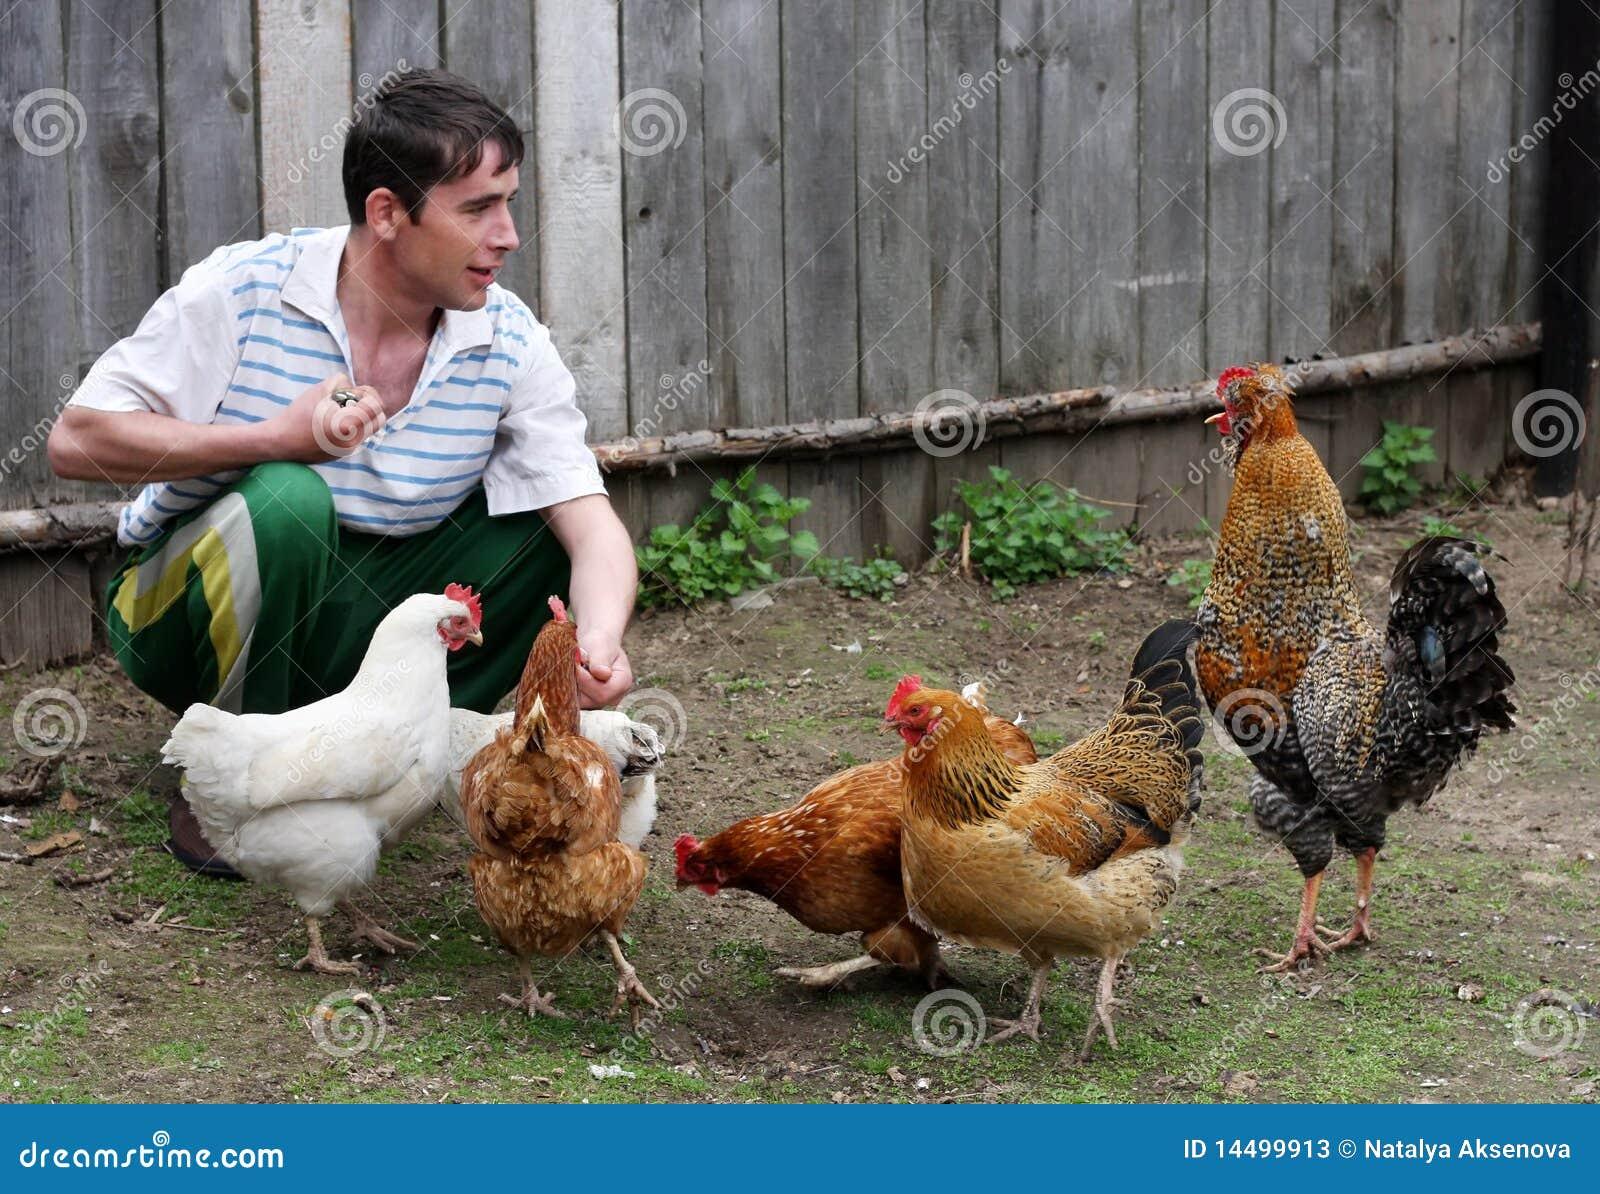 Man feeds hens